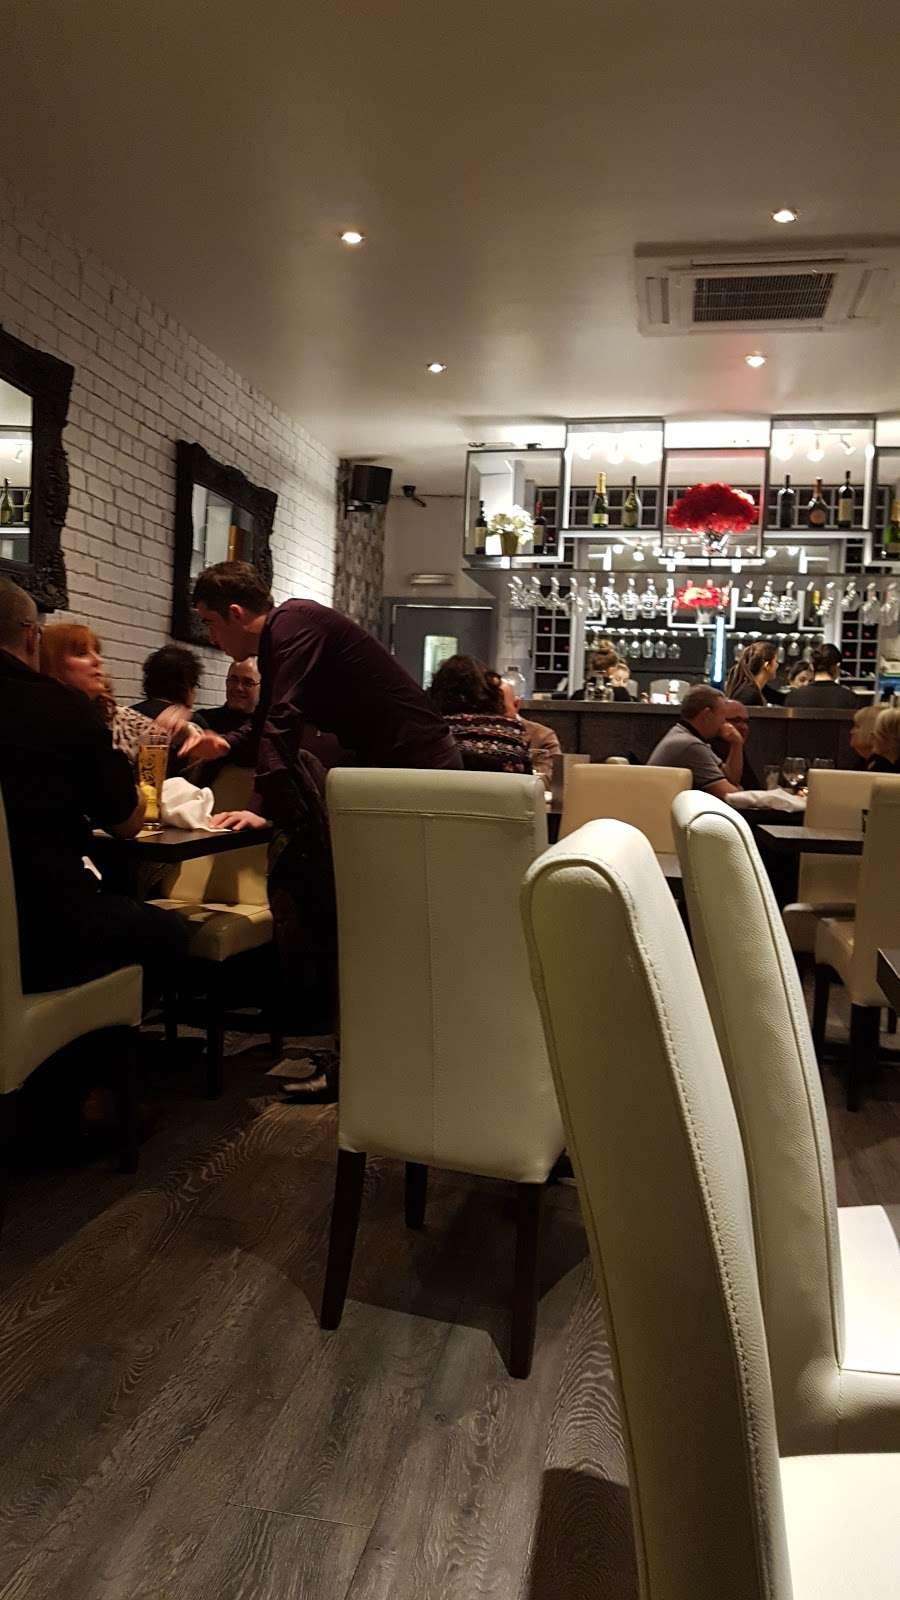 Riennas Restaurant - restaurant  | Photo 9 of 10 | Address: 210-176, A124, Hornchurch RM12 6QP, UK | Phone: 01708 469463